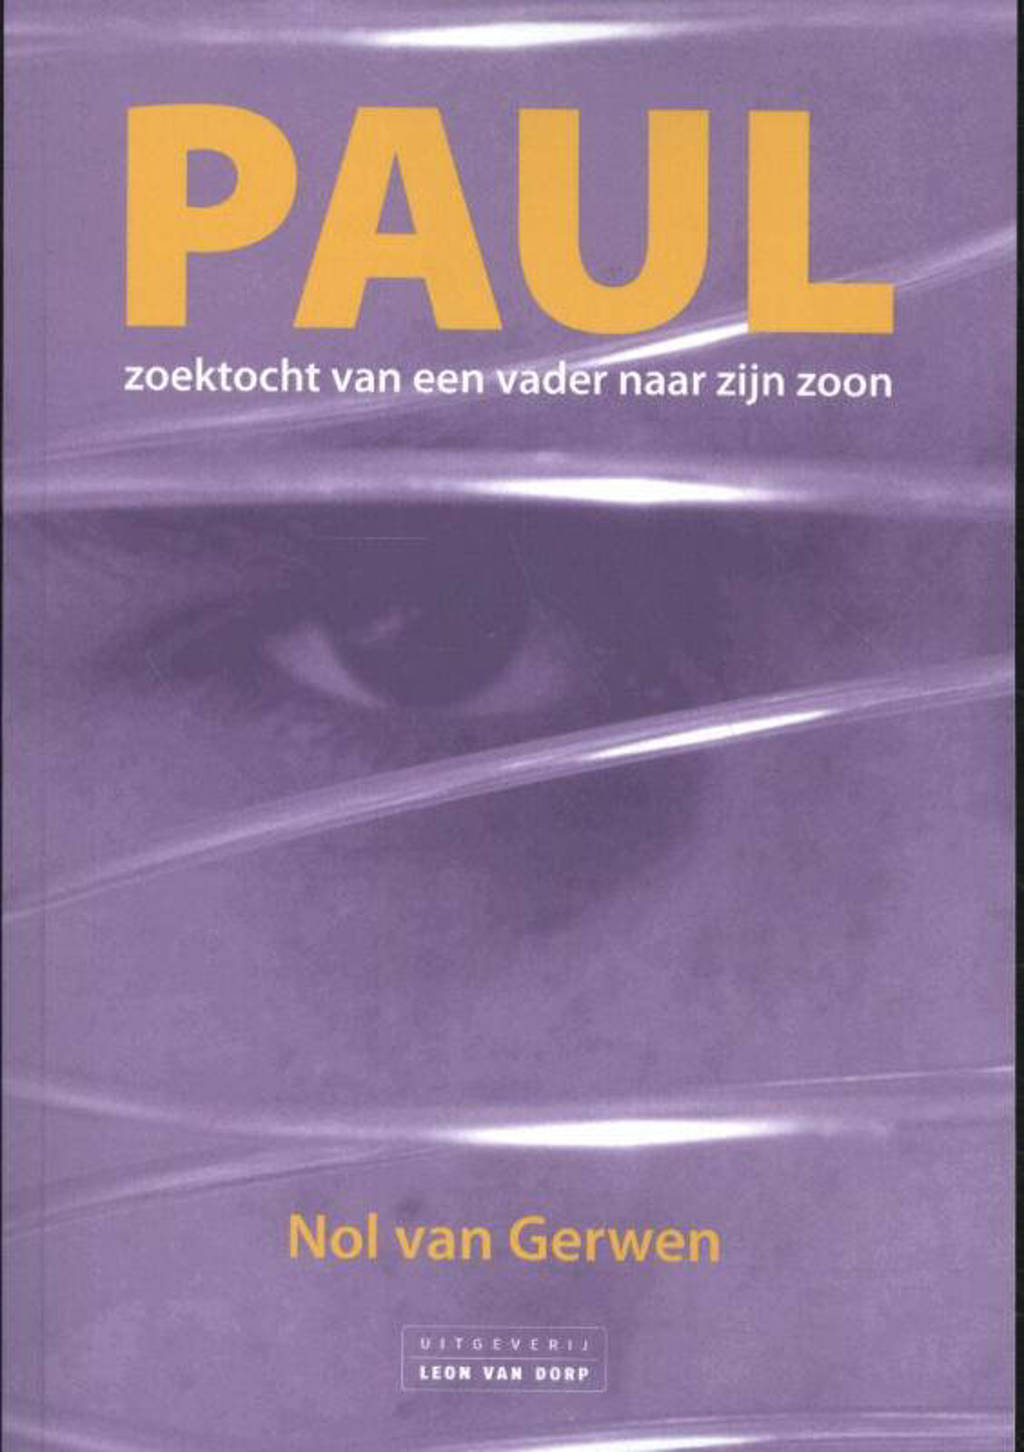 Paul - Nol van Gerwen